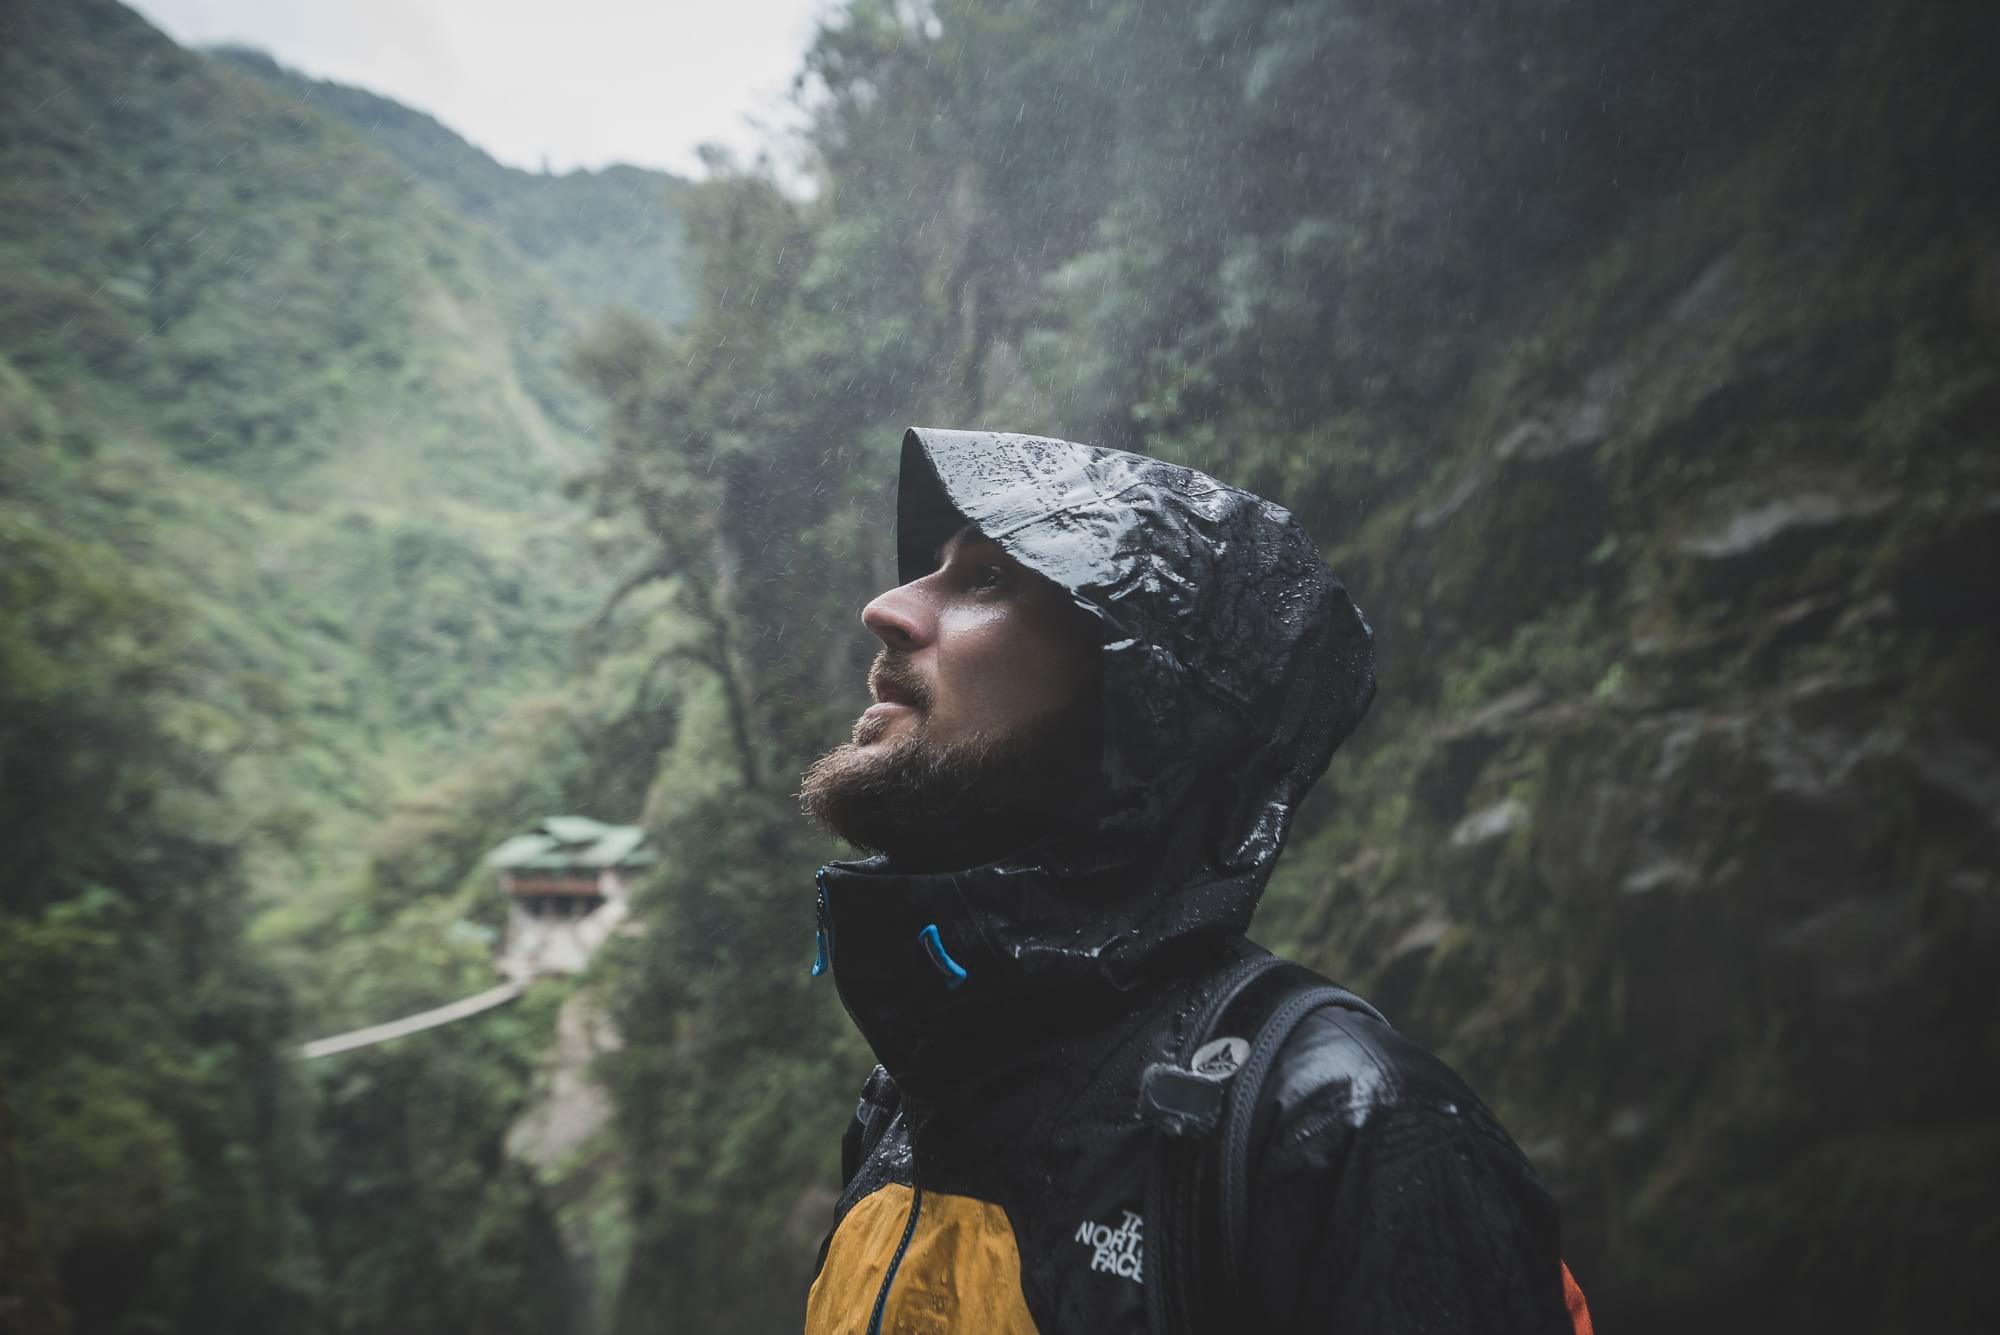 ecuador-portrait-waltsmedia-südamerika-lateinamerika-7